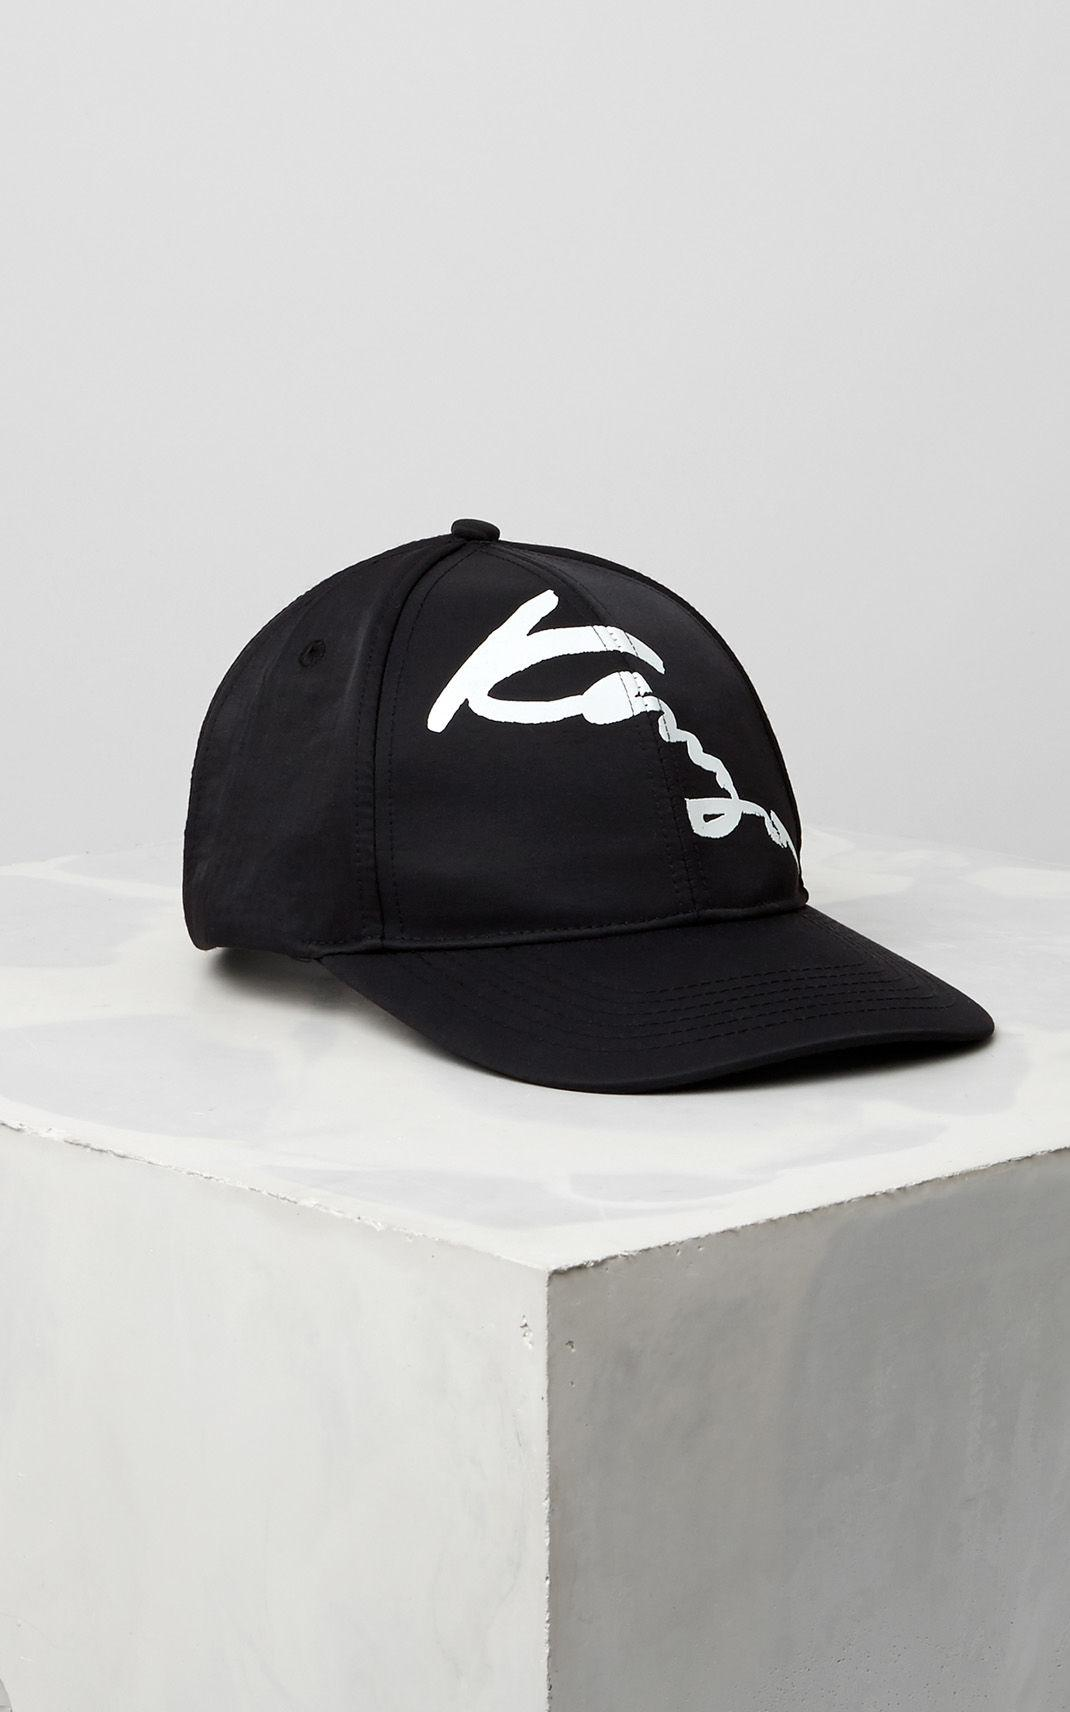 1ceb7d34805 Kenzo Signature Baseball Cap in Black for Men - Lyst